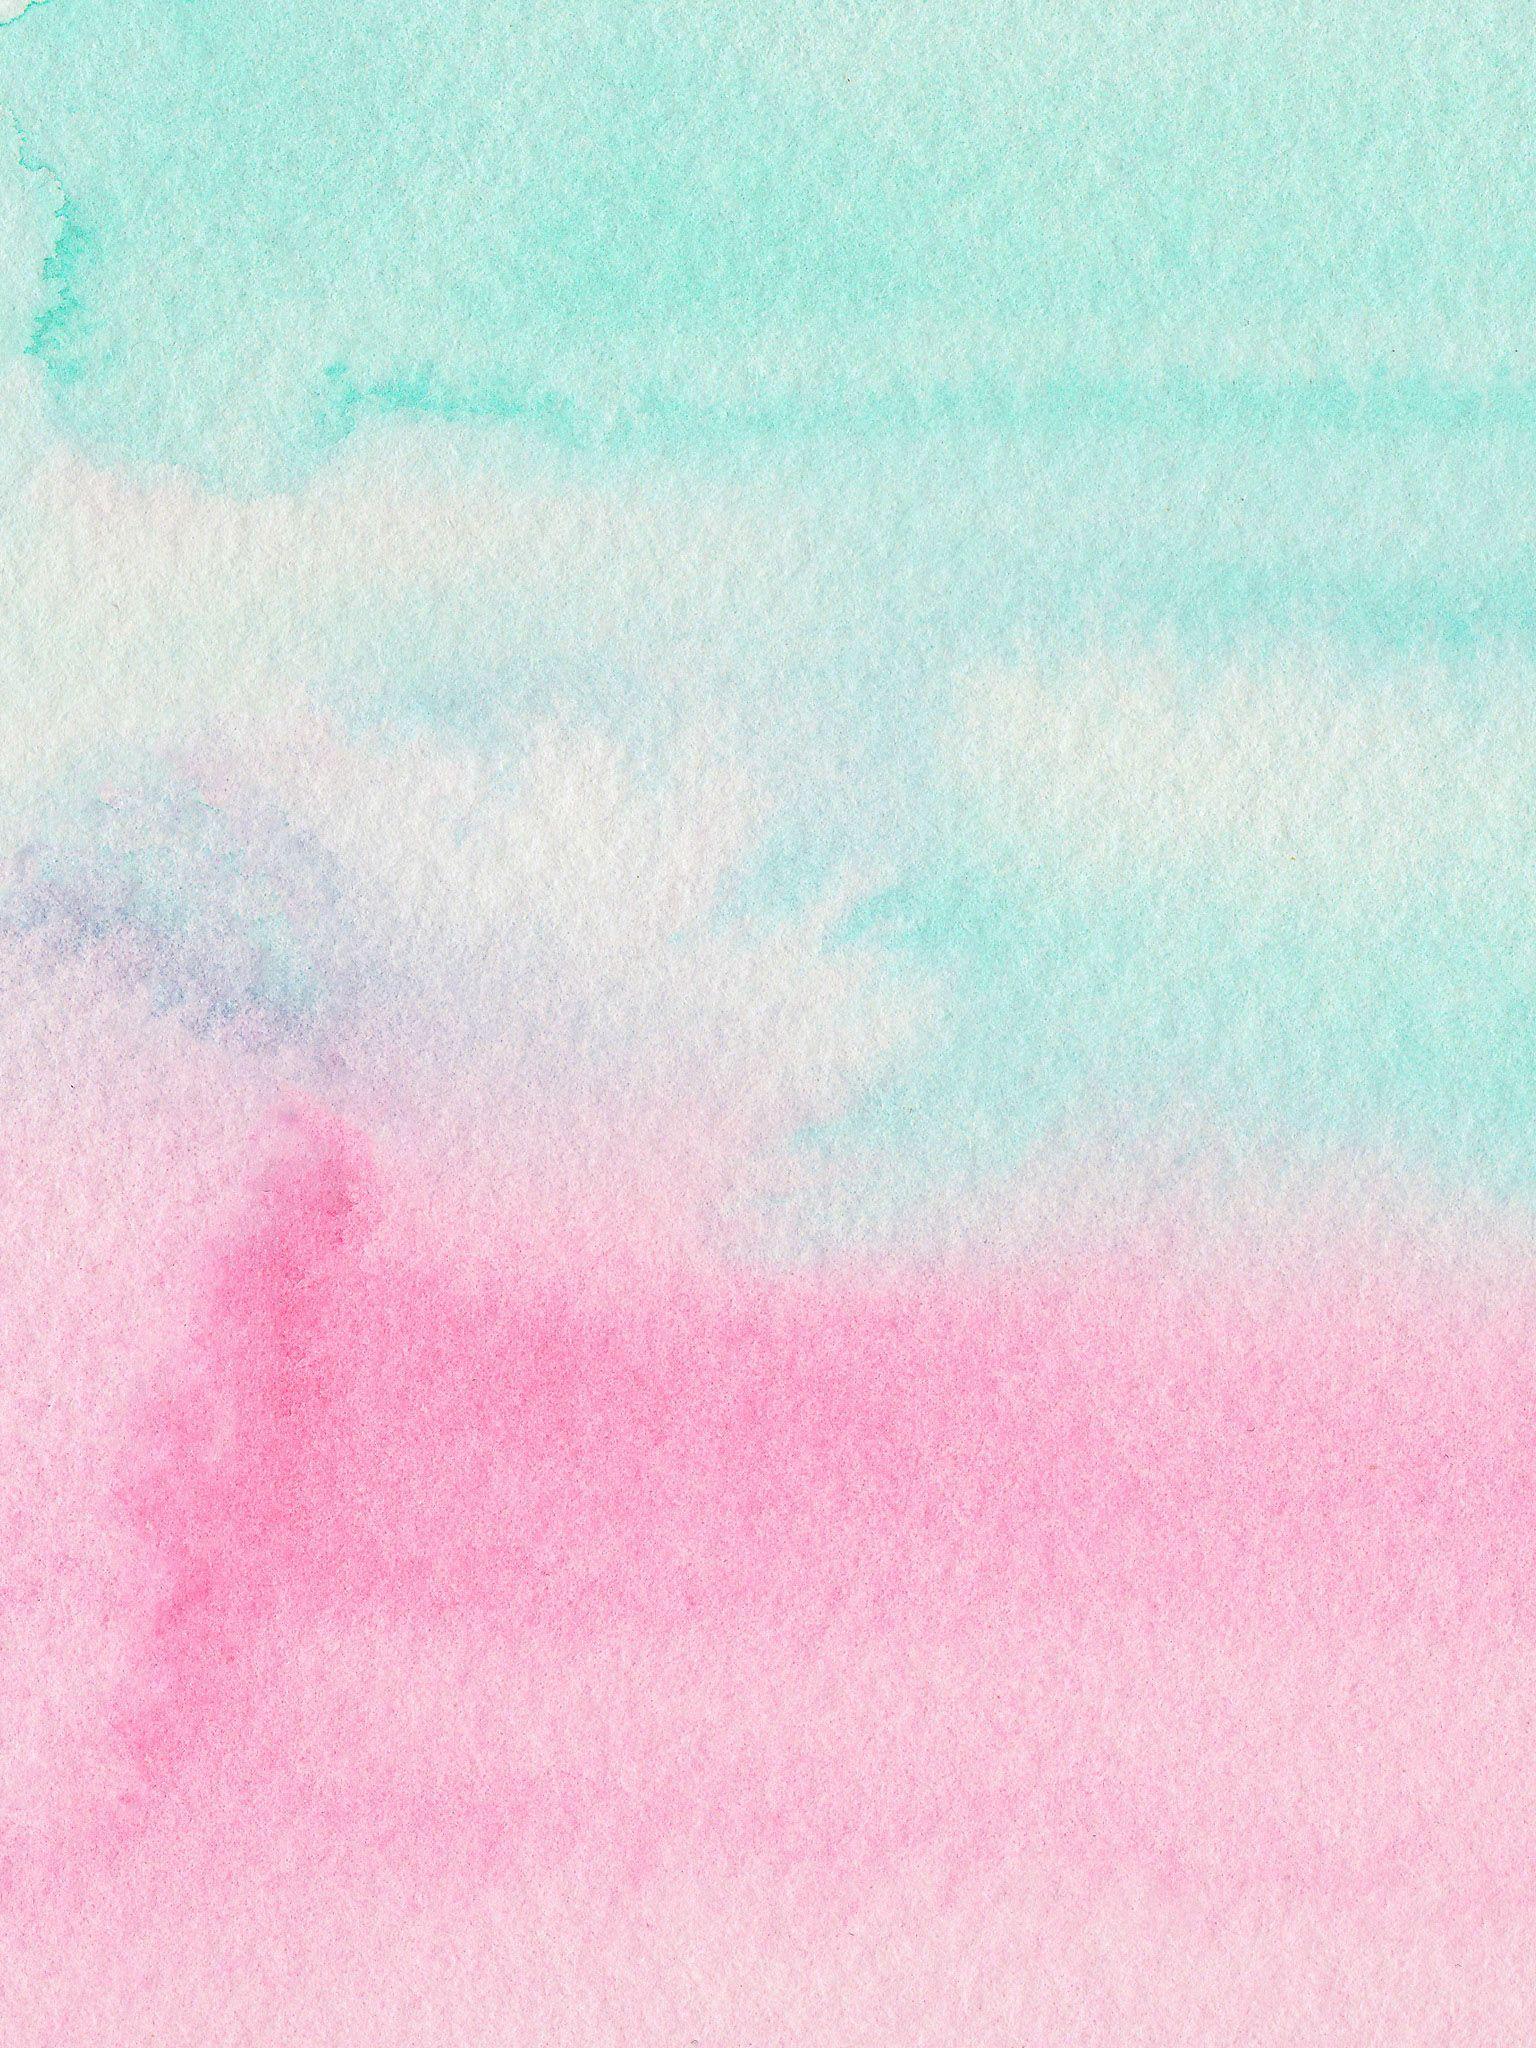 ombre desktop wallpaper downloads something peach iphone